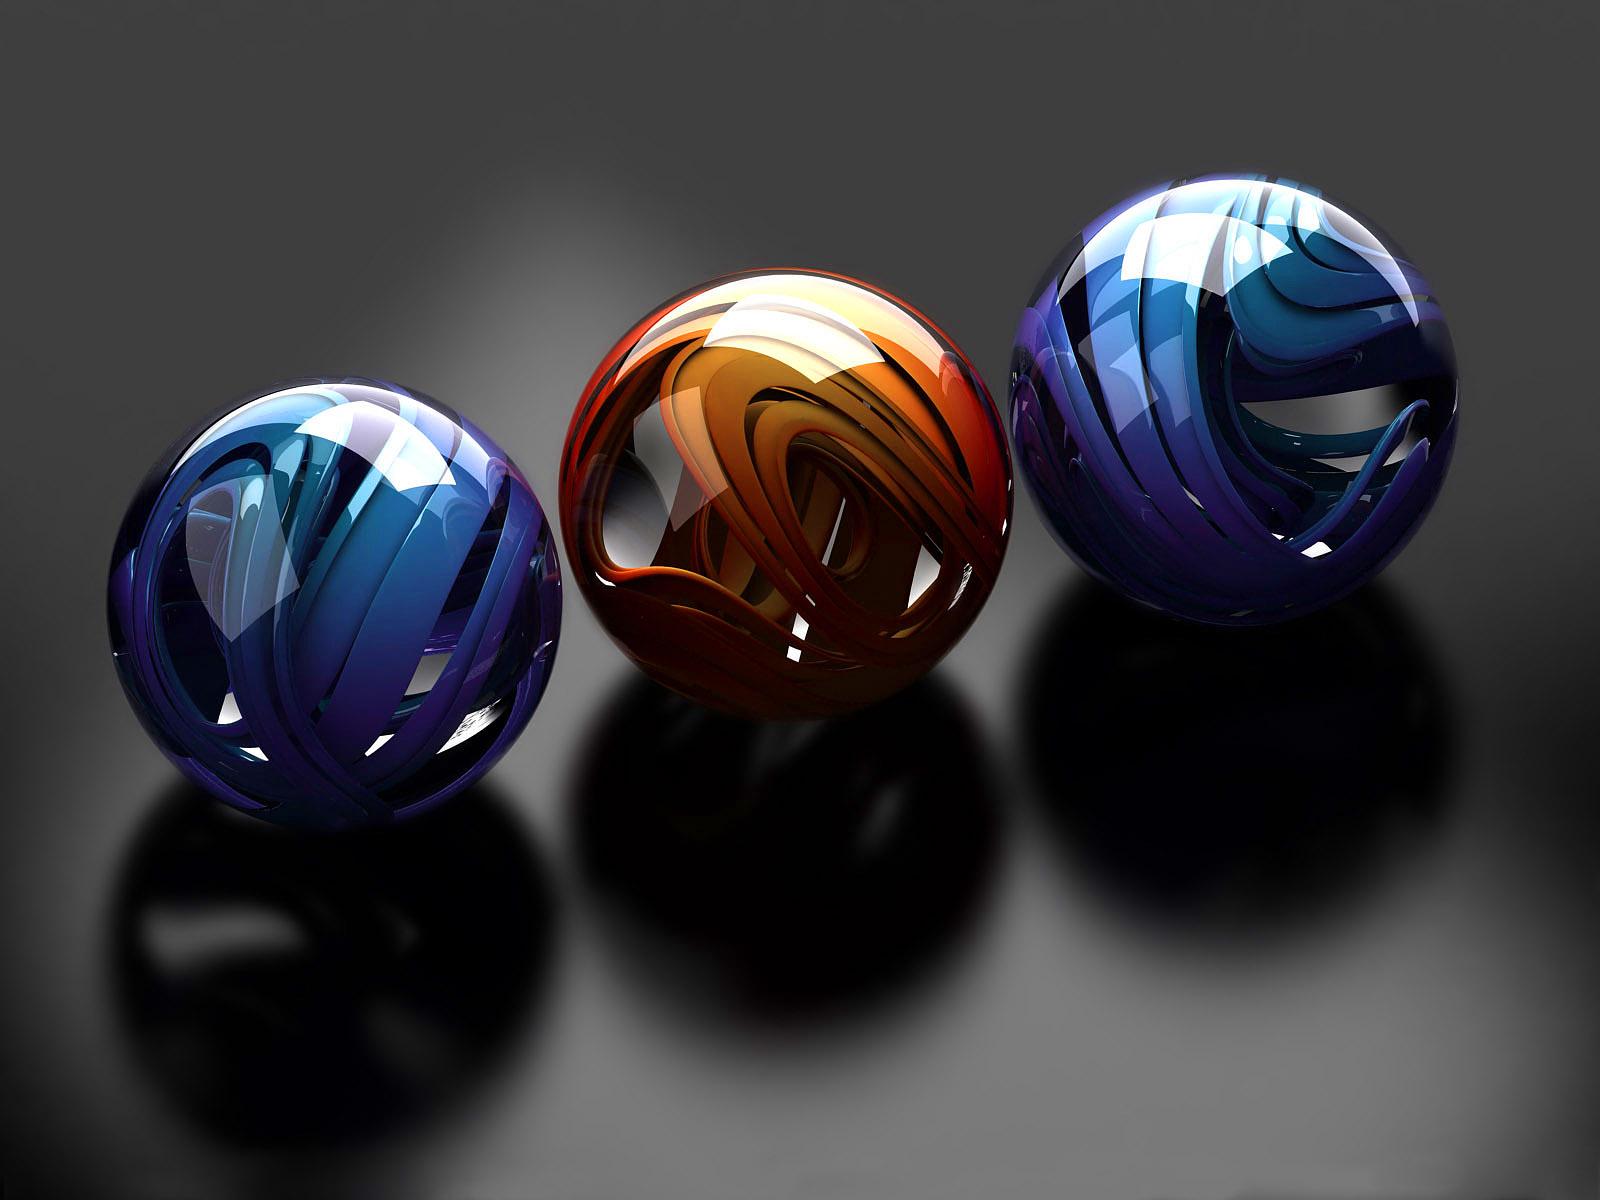 3d balls wallpapers top best hd wallpapers for desktop for Best 3d wallpaper